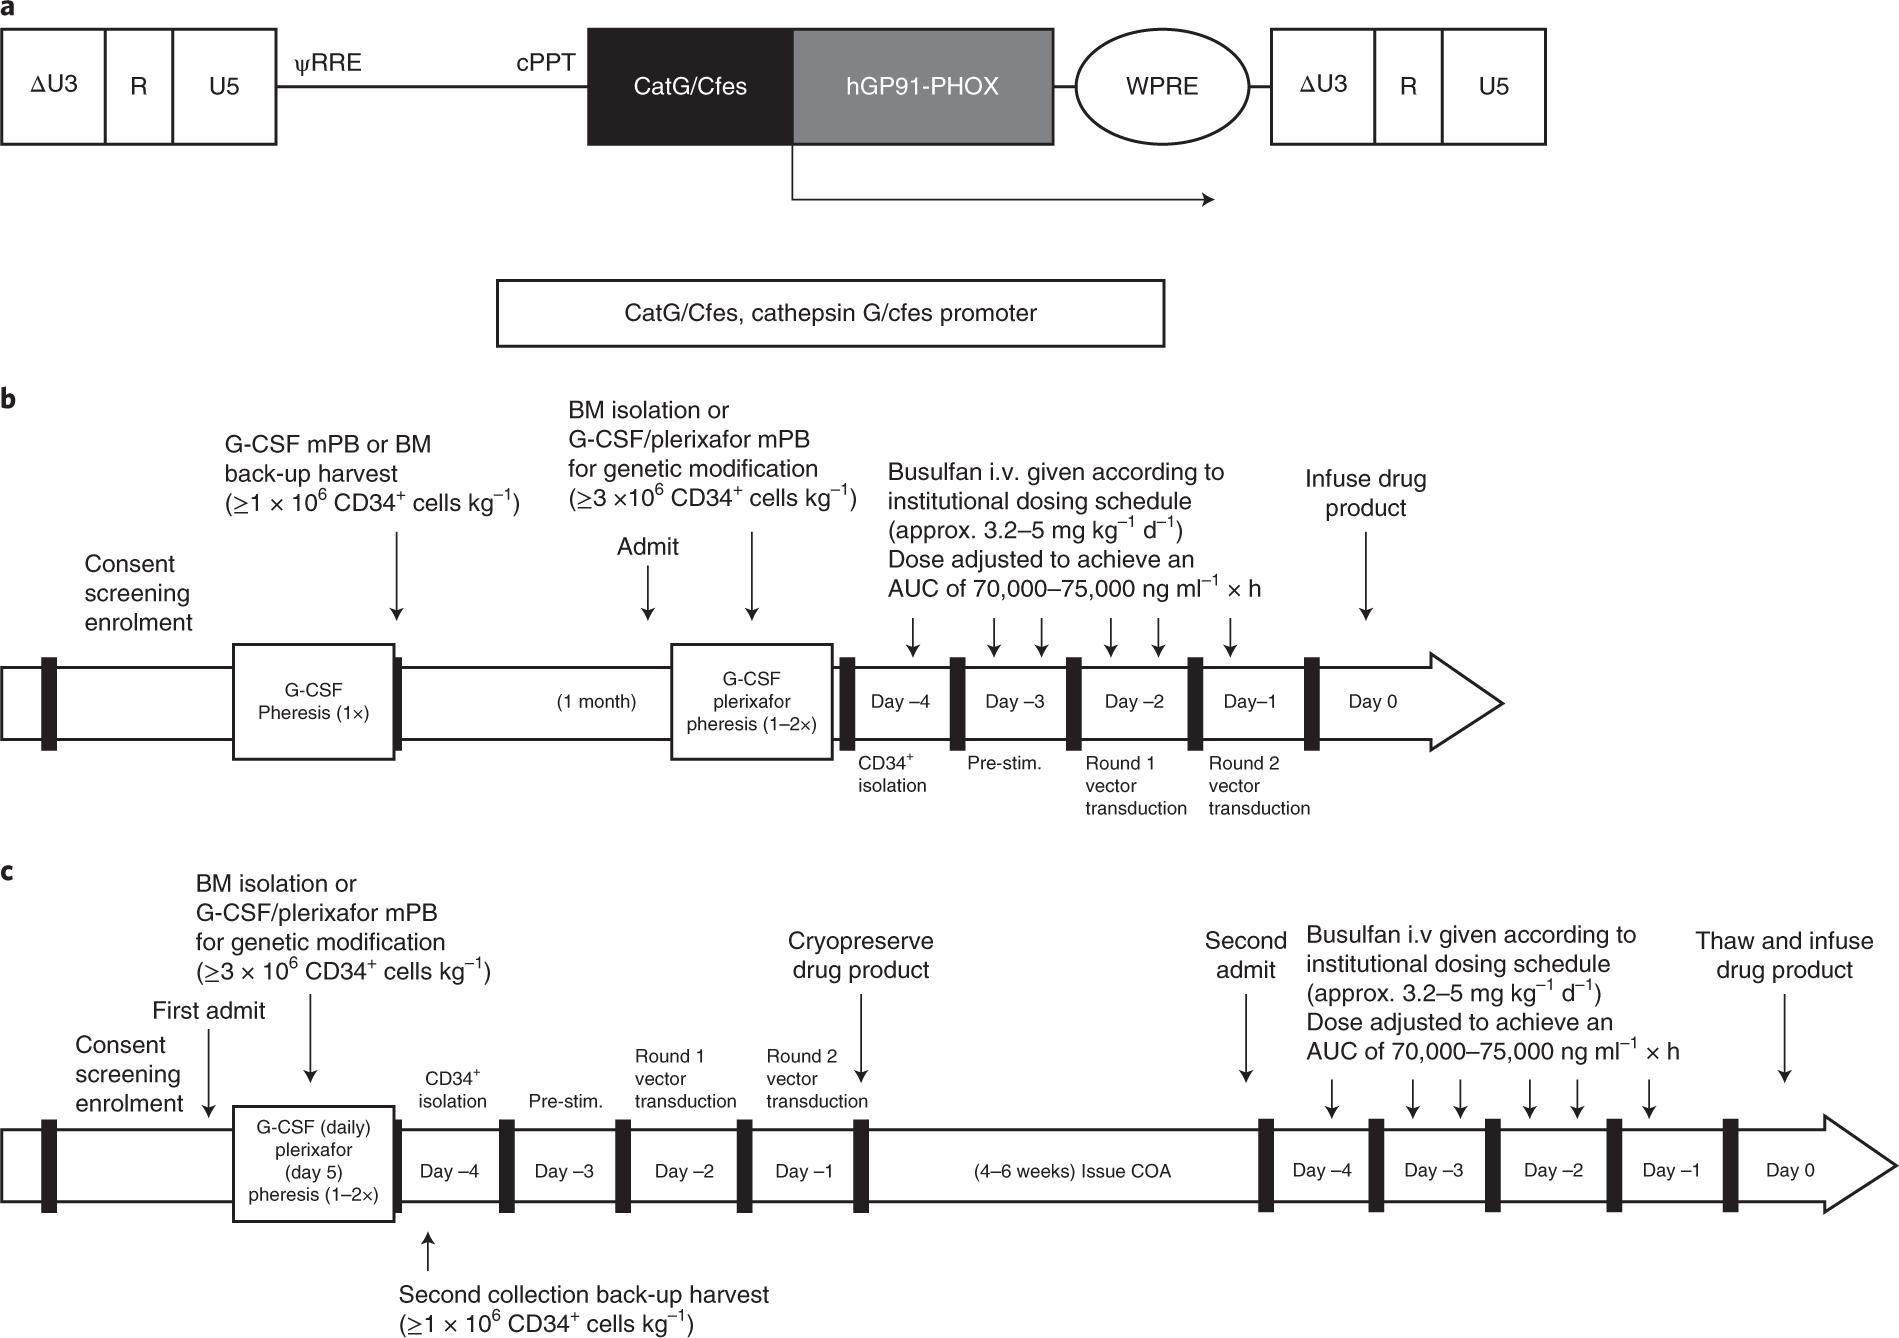 Lentiviral gene therapy for X-linked chronic granulomatous disease